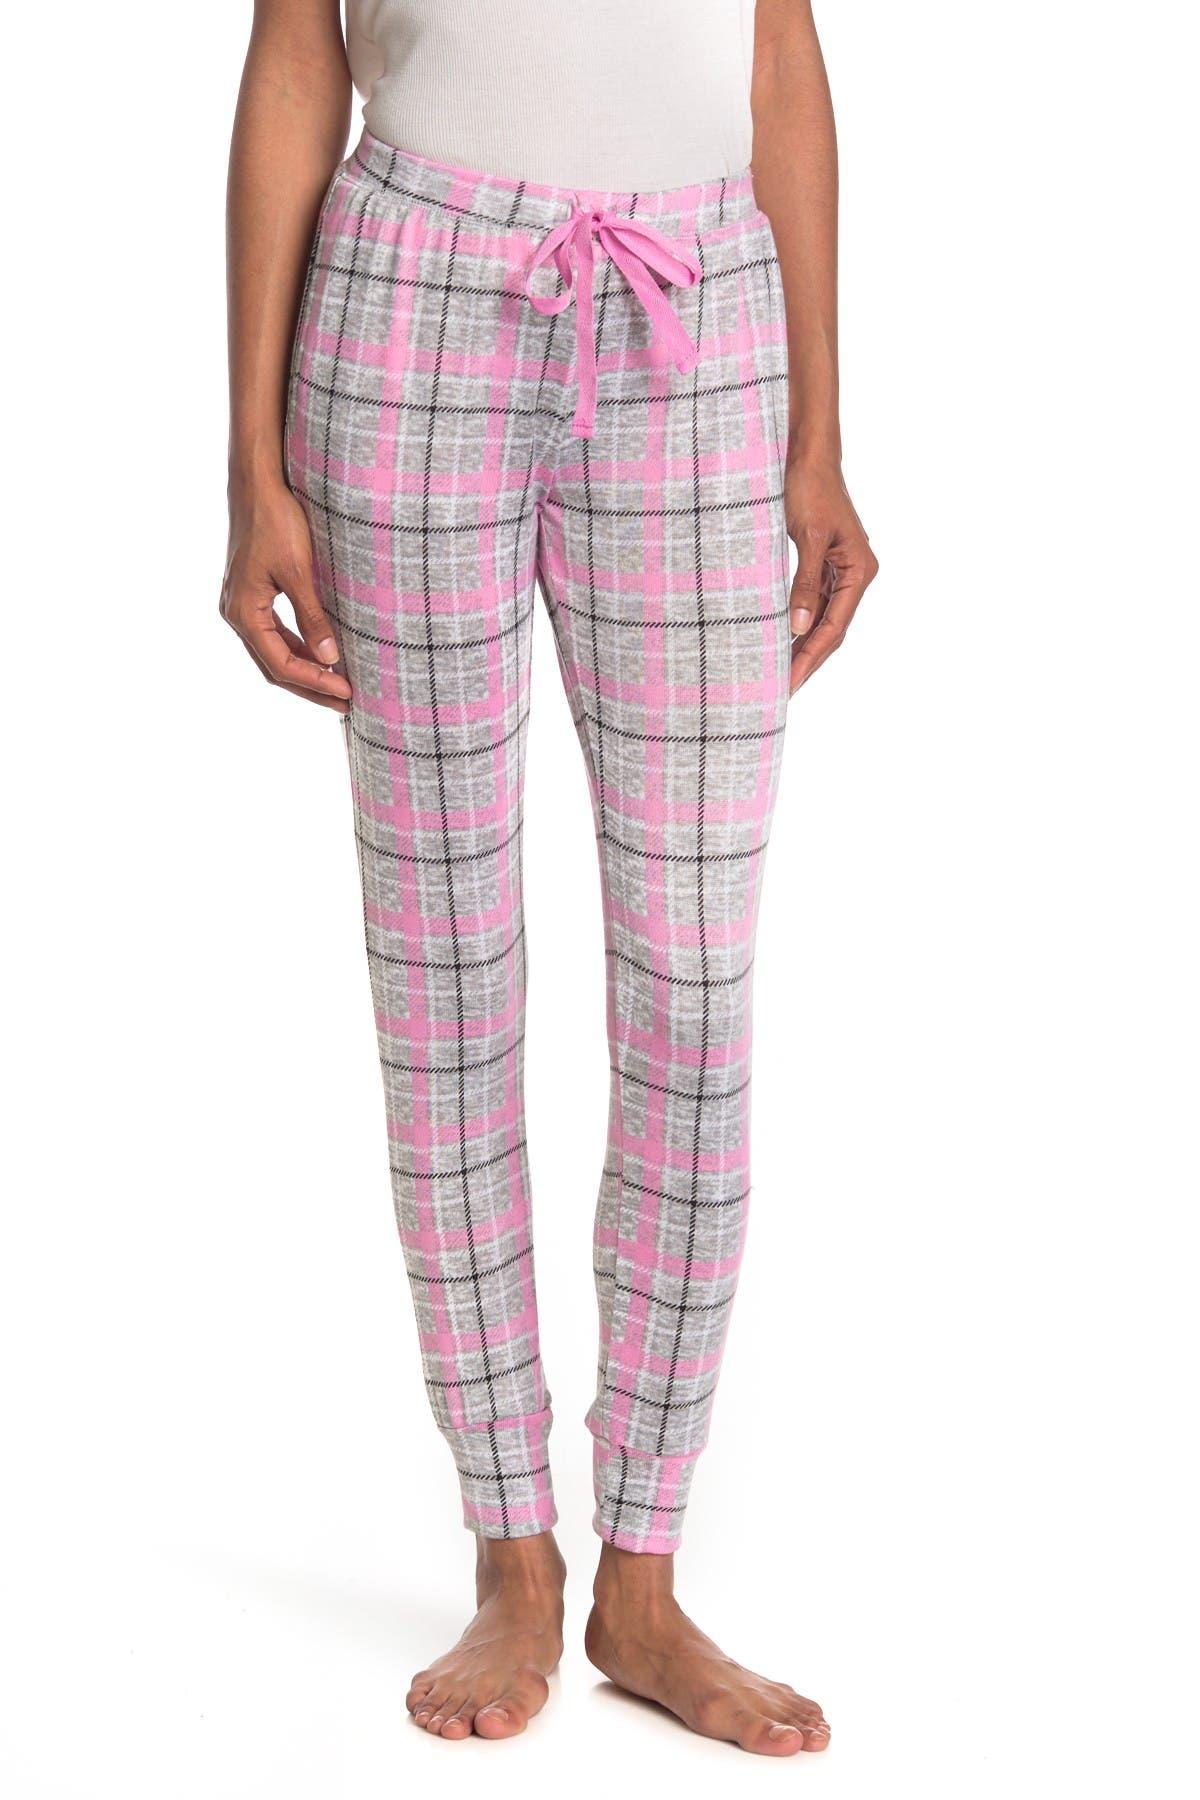 Image of PJ Couture Plaid Print Jogger Pajama Bottoms